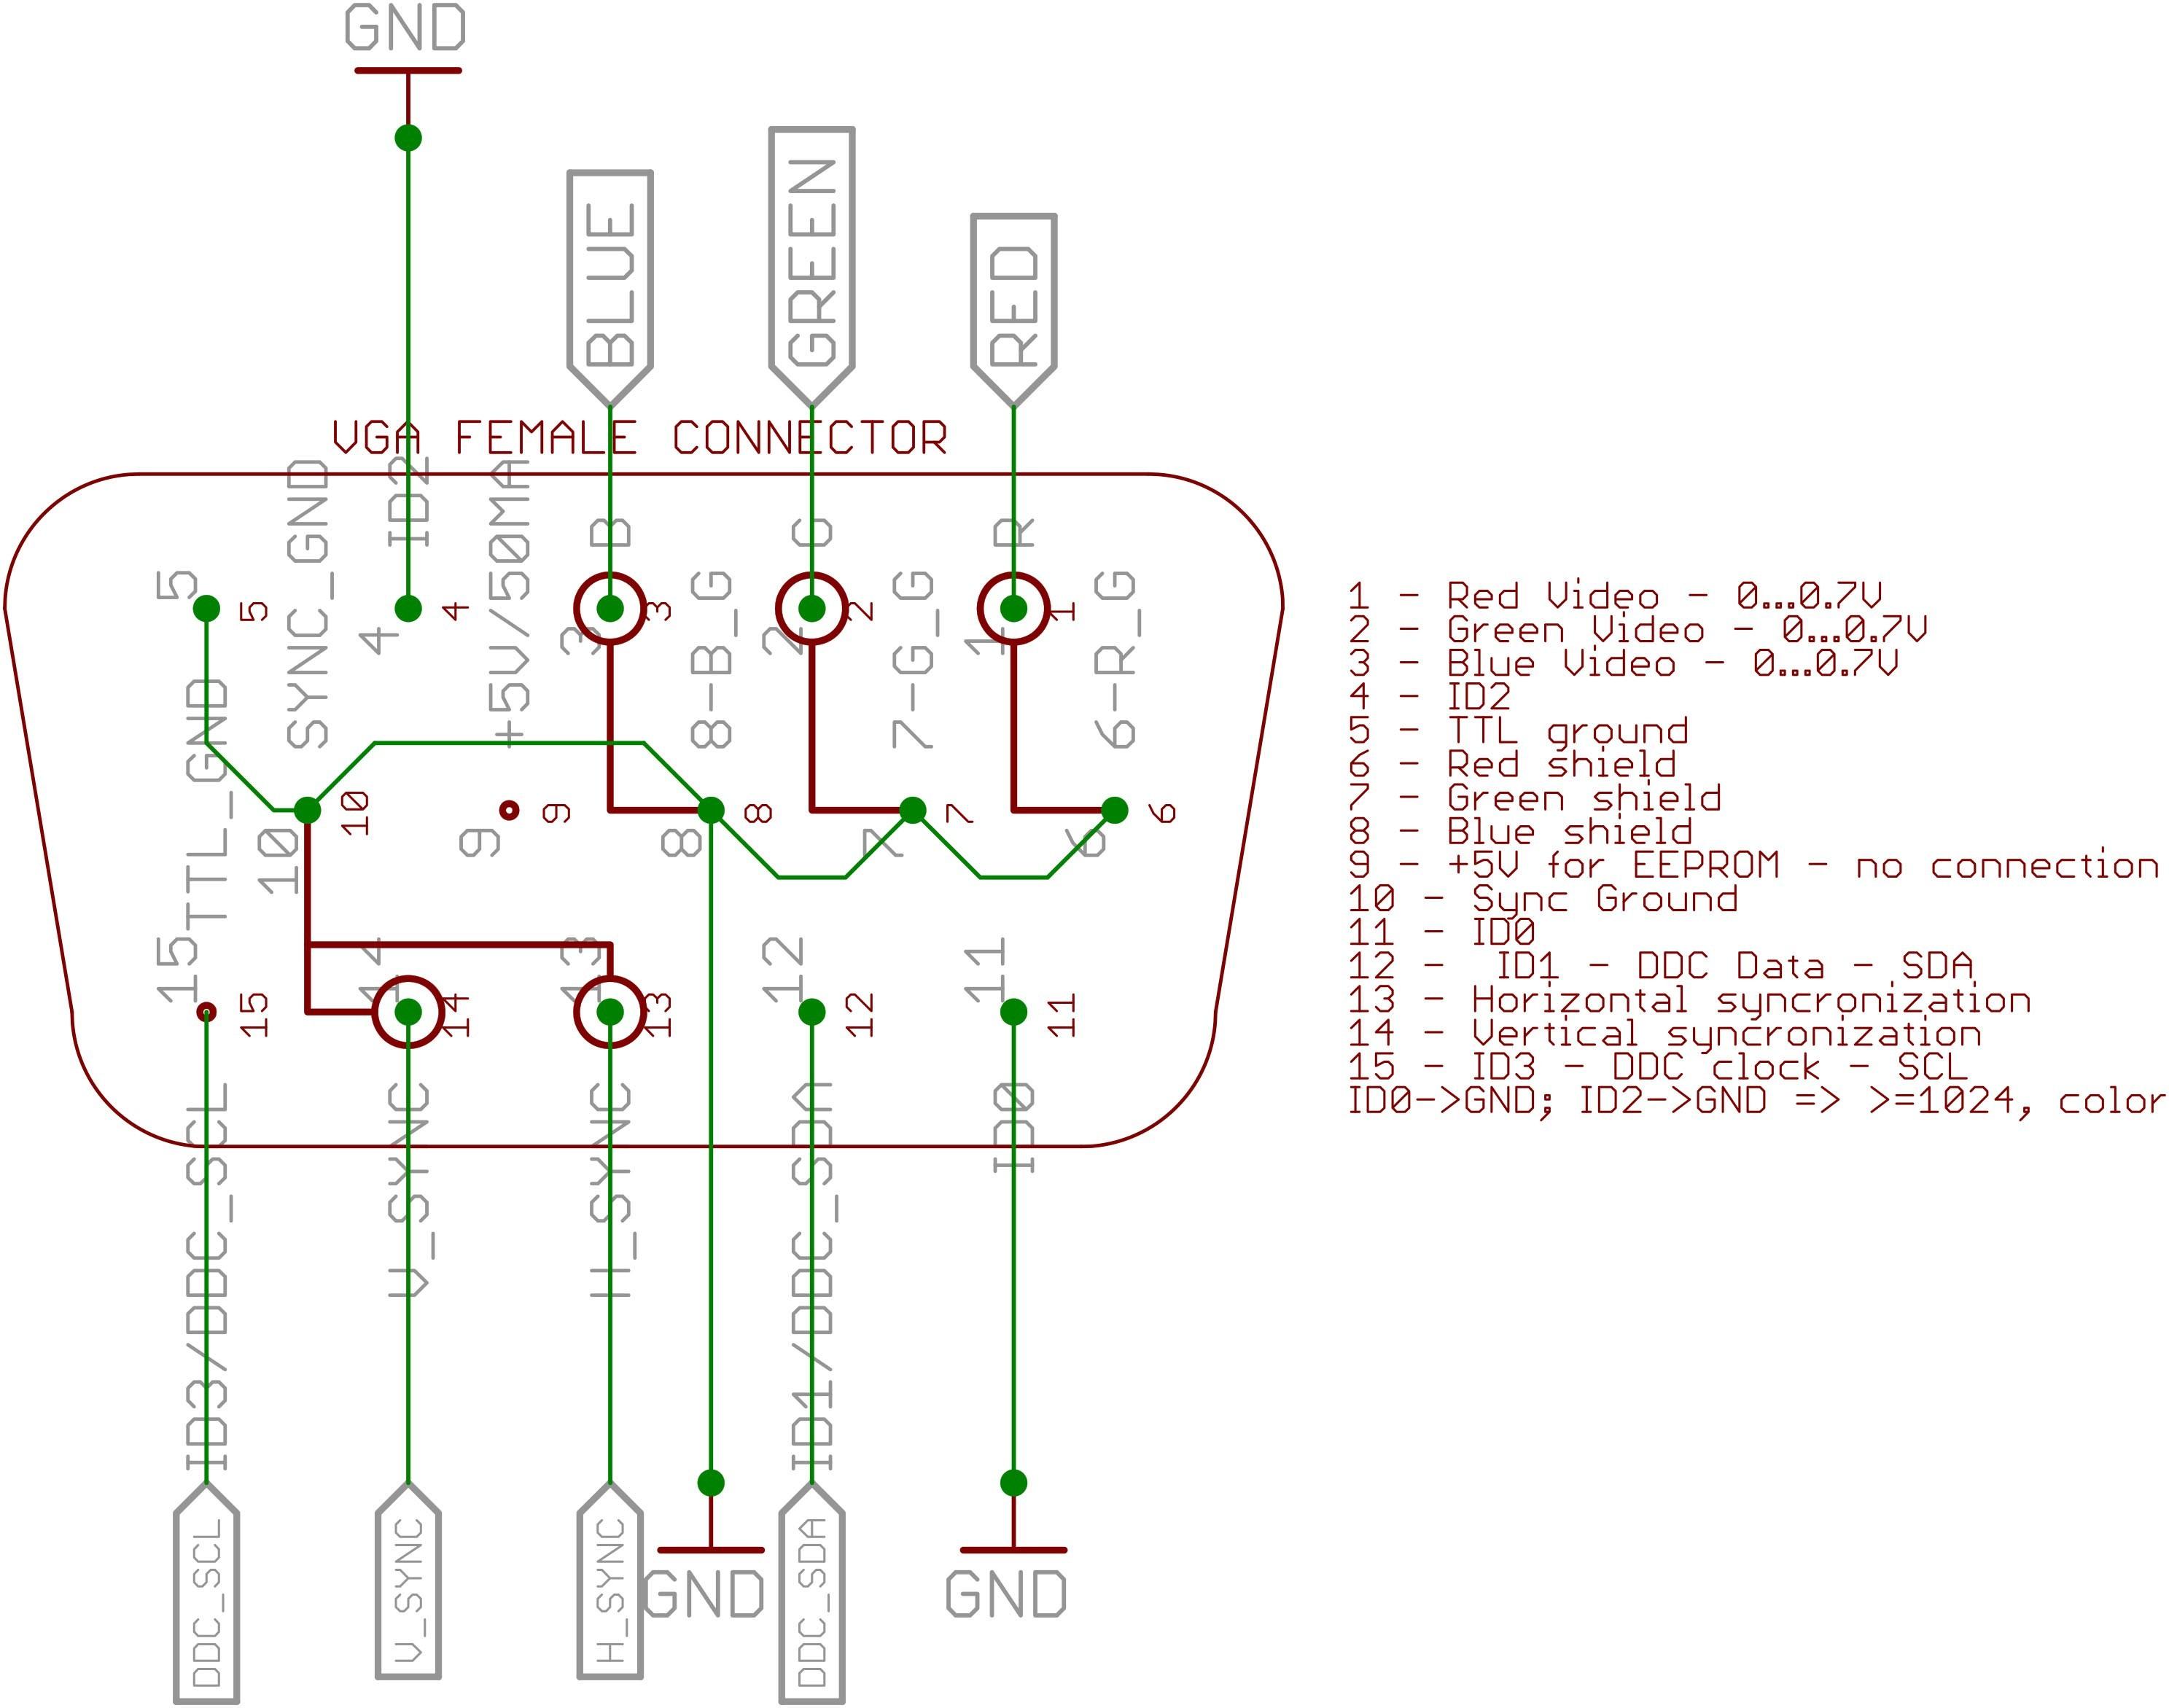 hdmi to vga wiring diagram unique ponent wiring diagram for vga to hbphelp of hdmi to vga wiring diagram dvi and vga diagram wiring diagram & electricity basics 101 \u2022